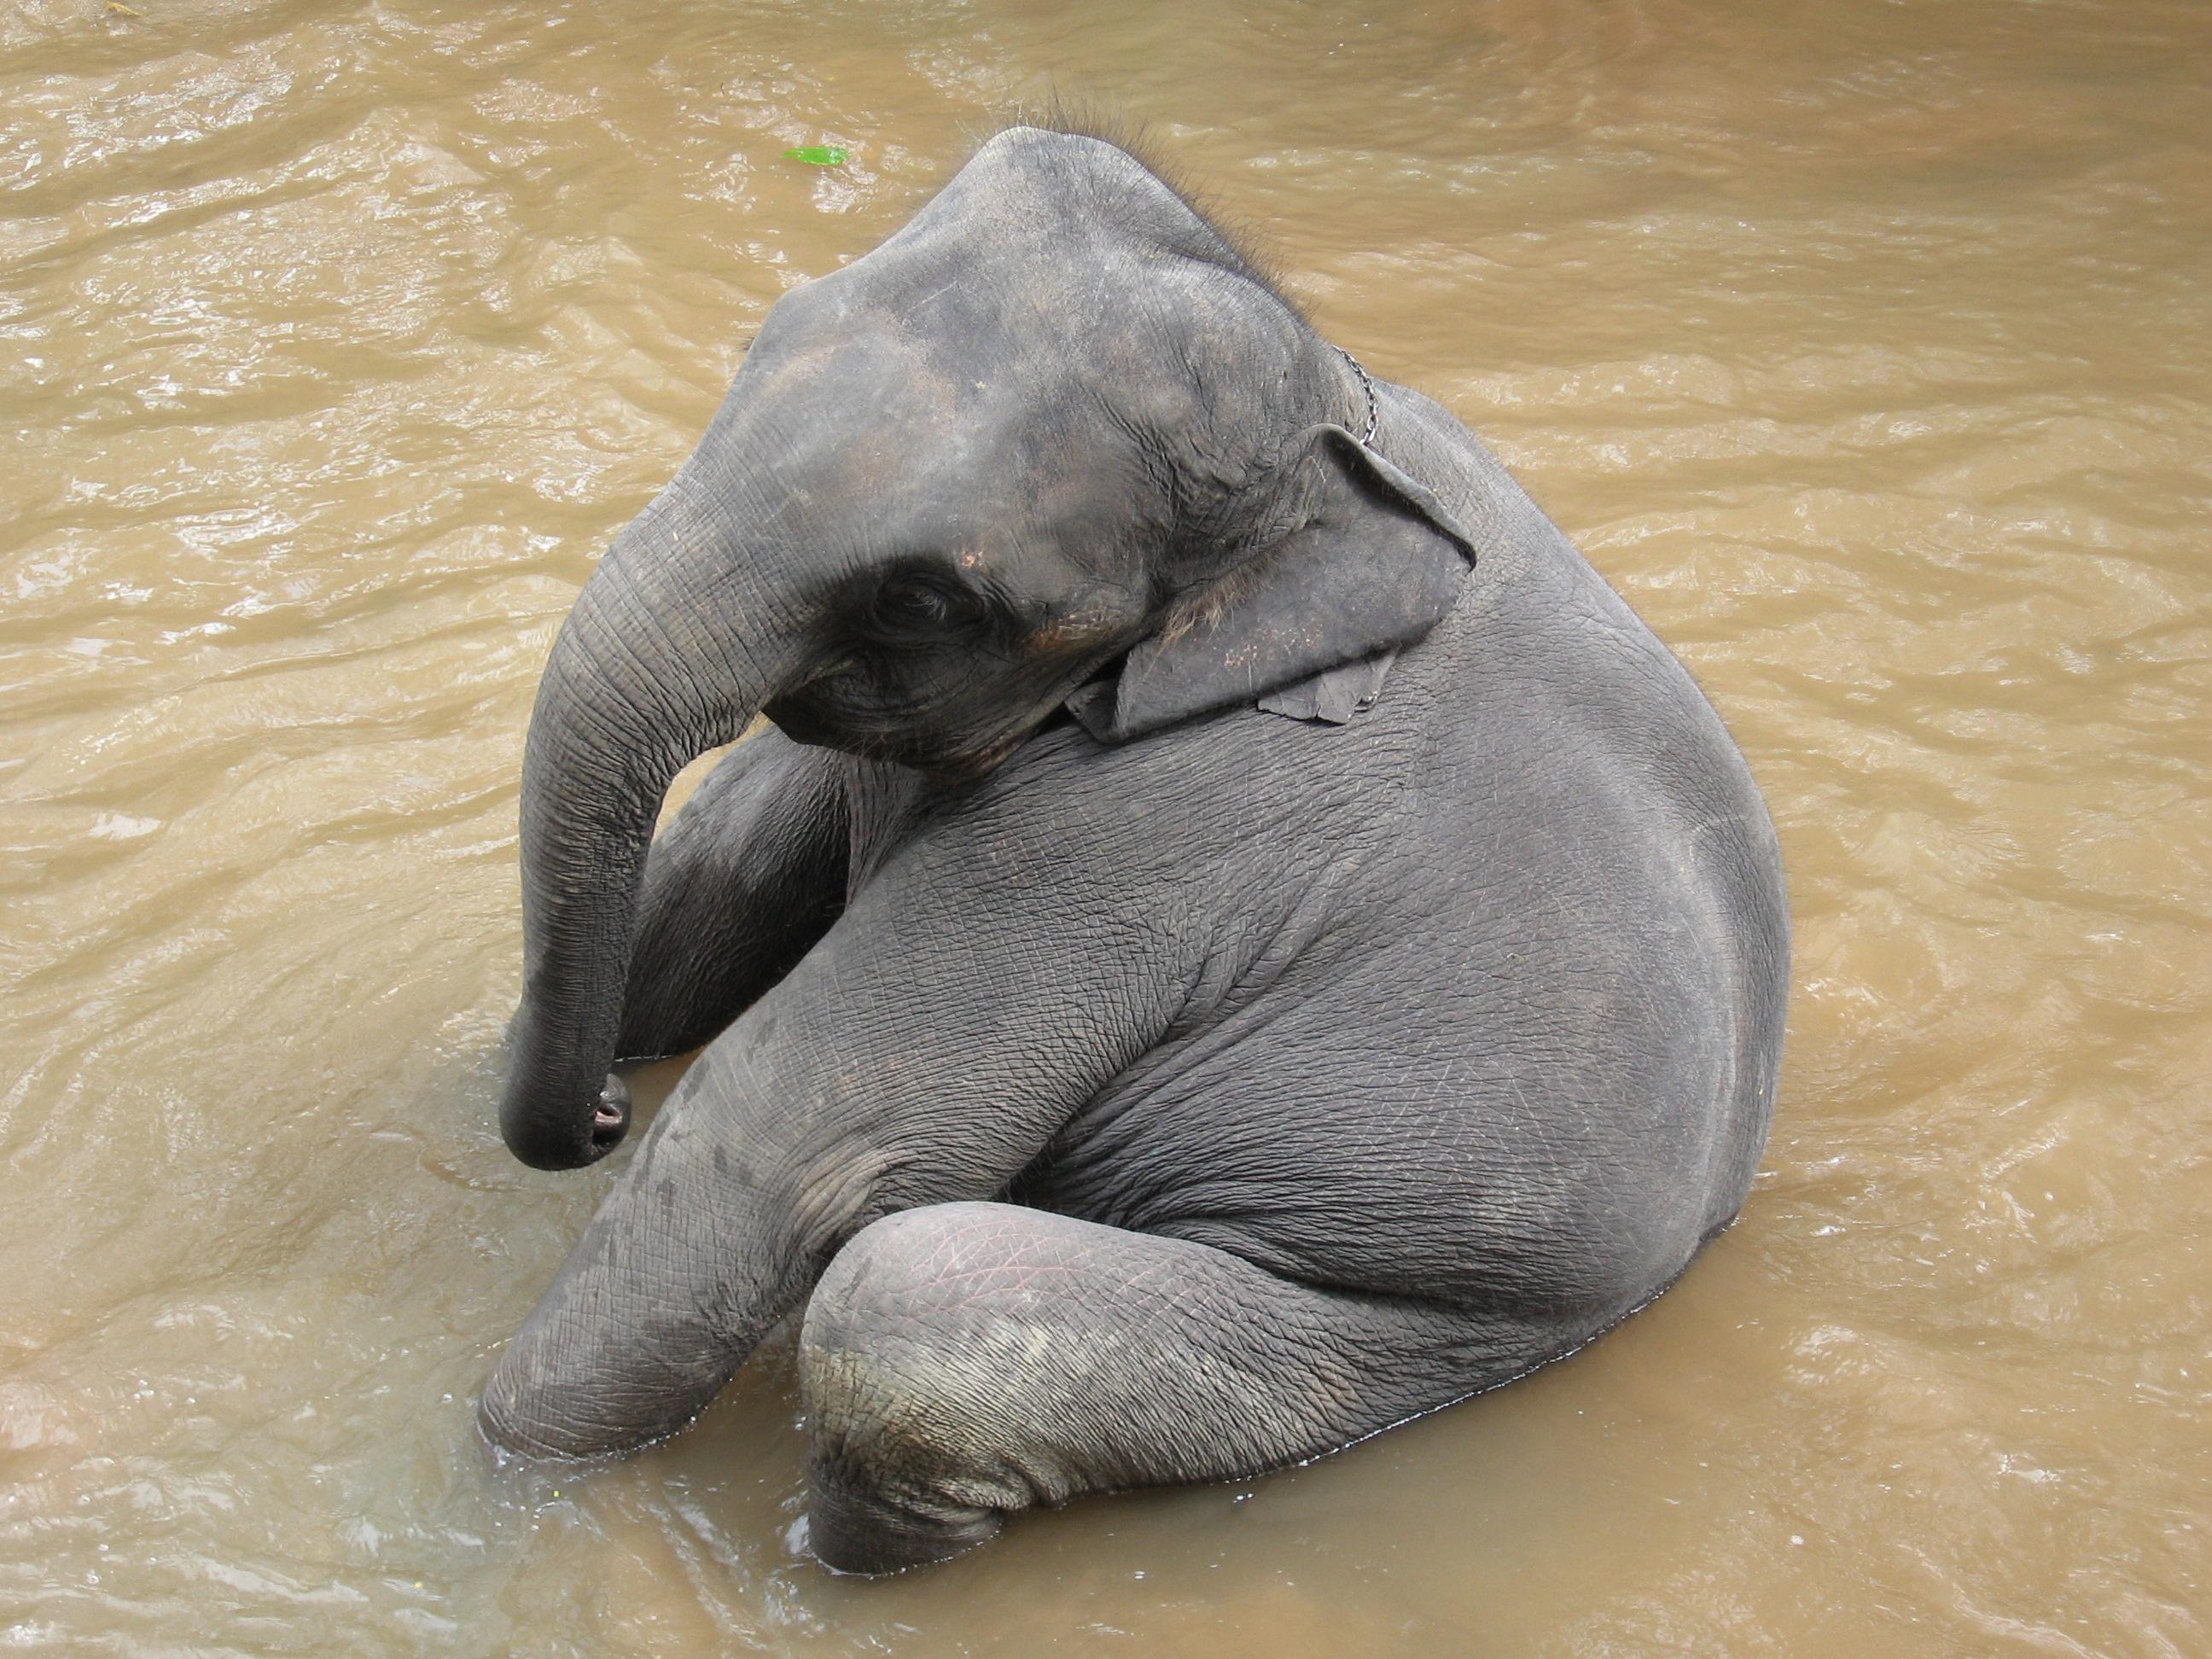 baby elephant A Cute A Day 2592x1944